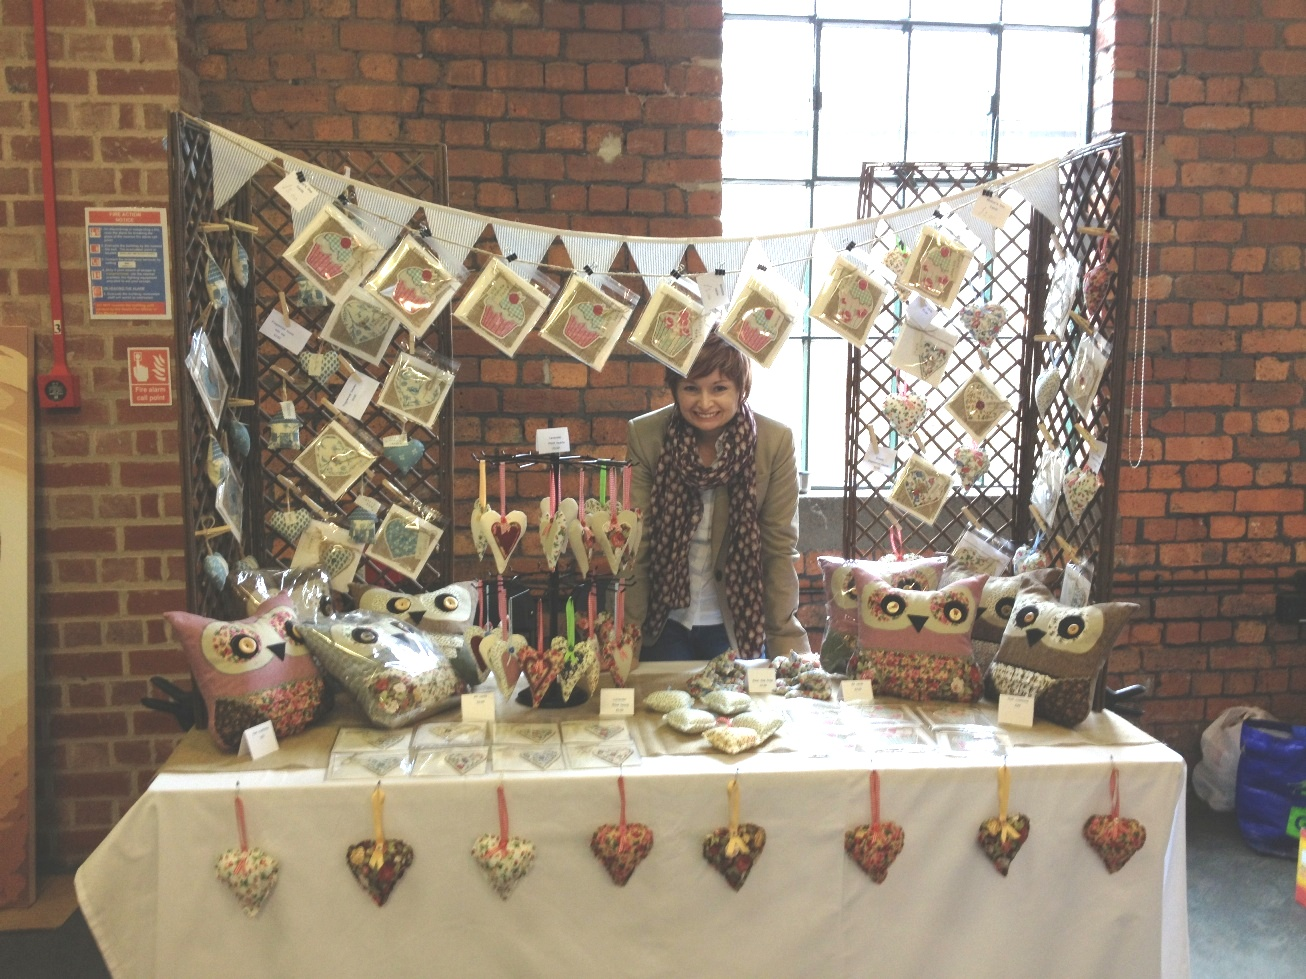 Craft Fair Stalls Inspiration On Pinterest Craft Stalls